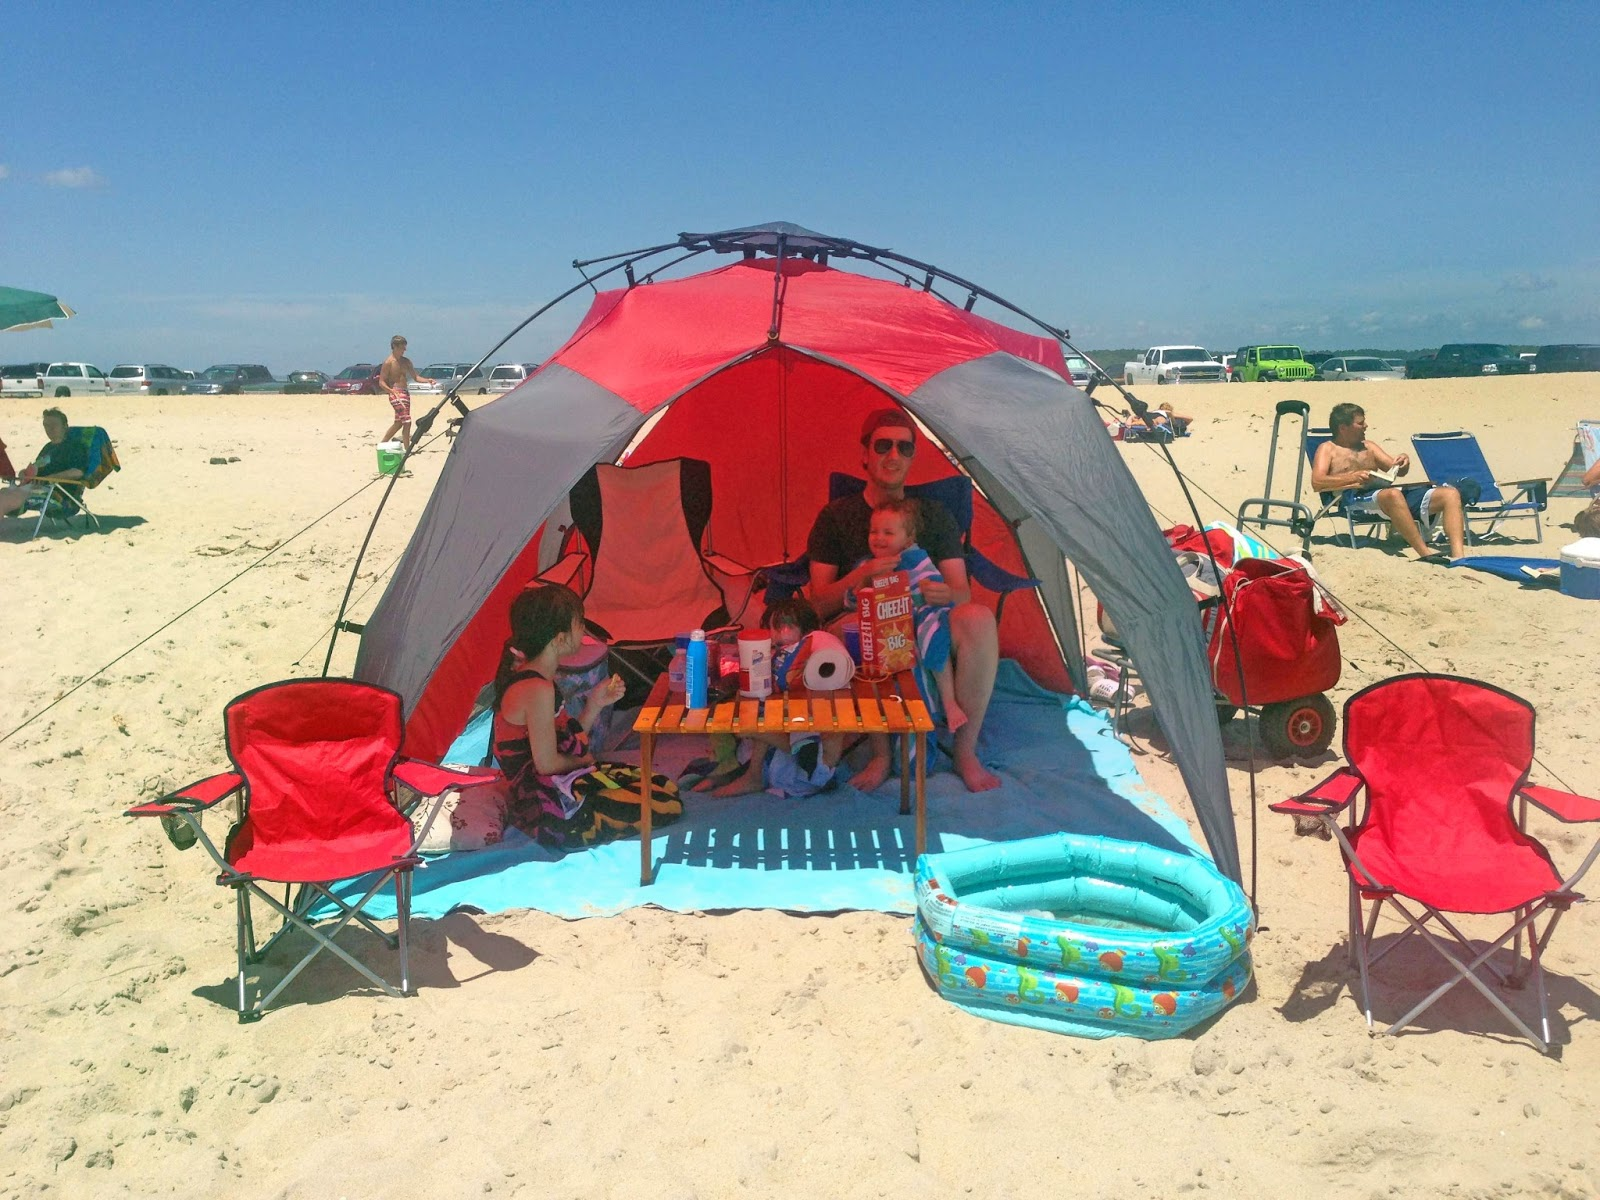 Best Pop Up Beach Tent : Grosgrain ultimate beach packing list review the top